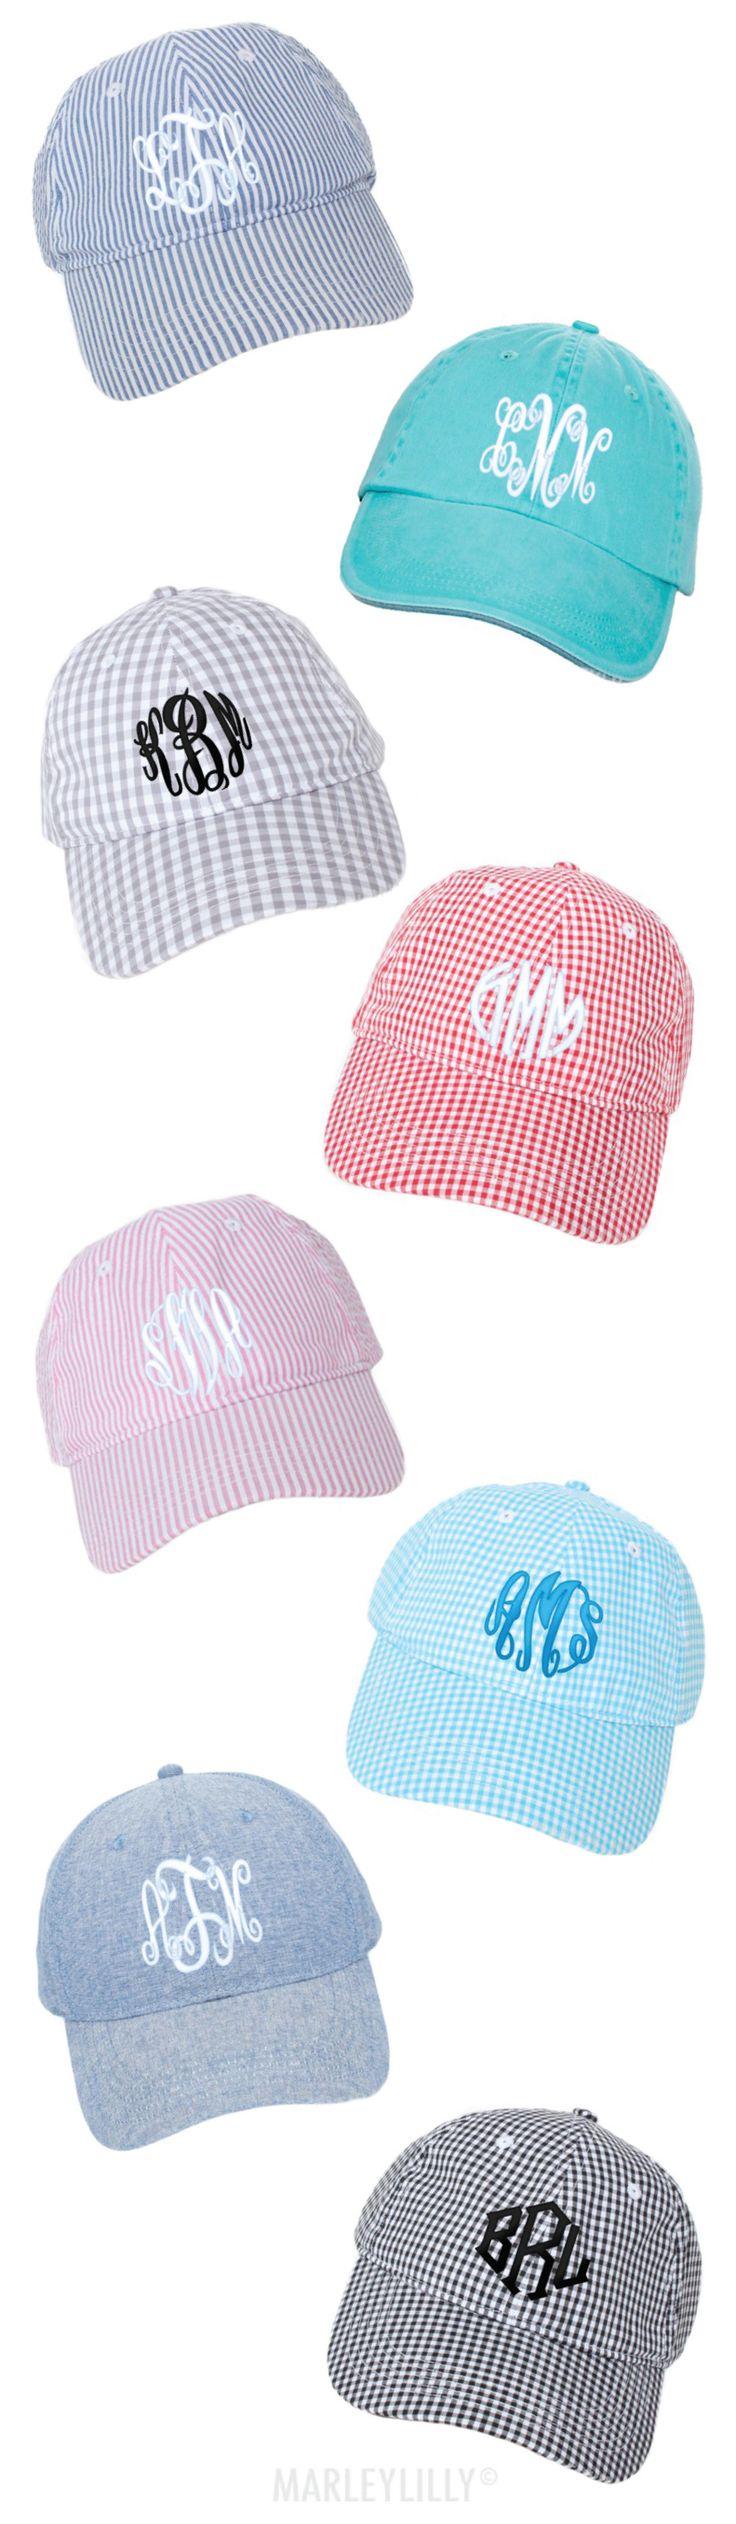 best 25+ cute baseball hats ideas on pinterest   cute hats